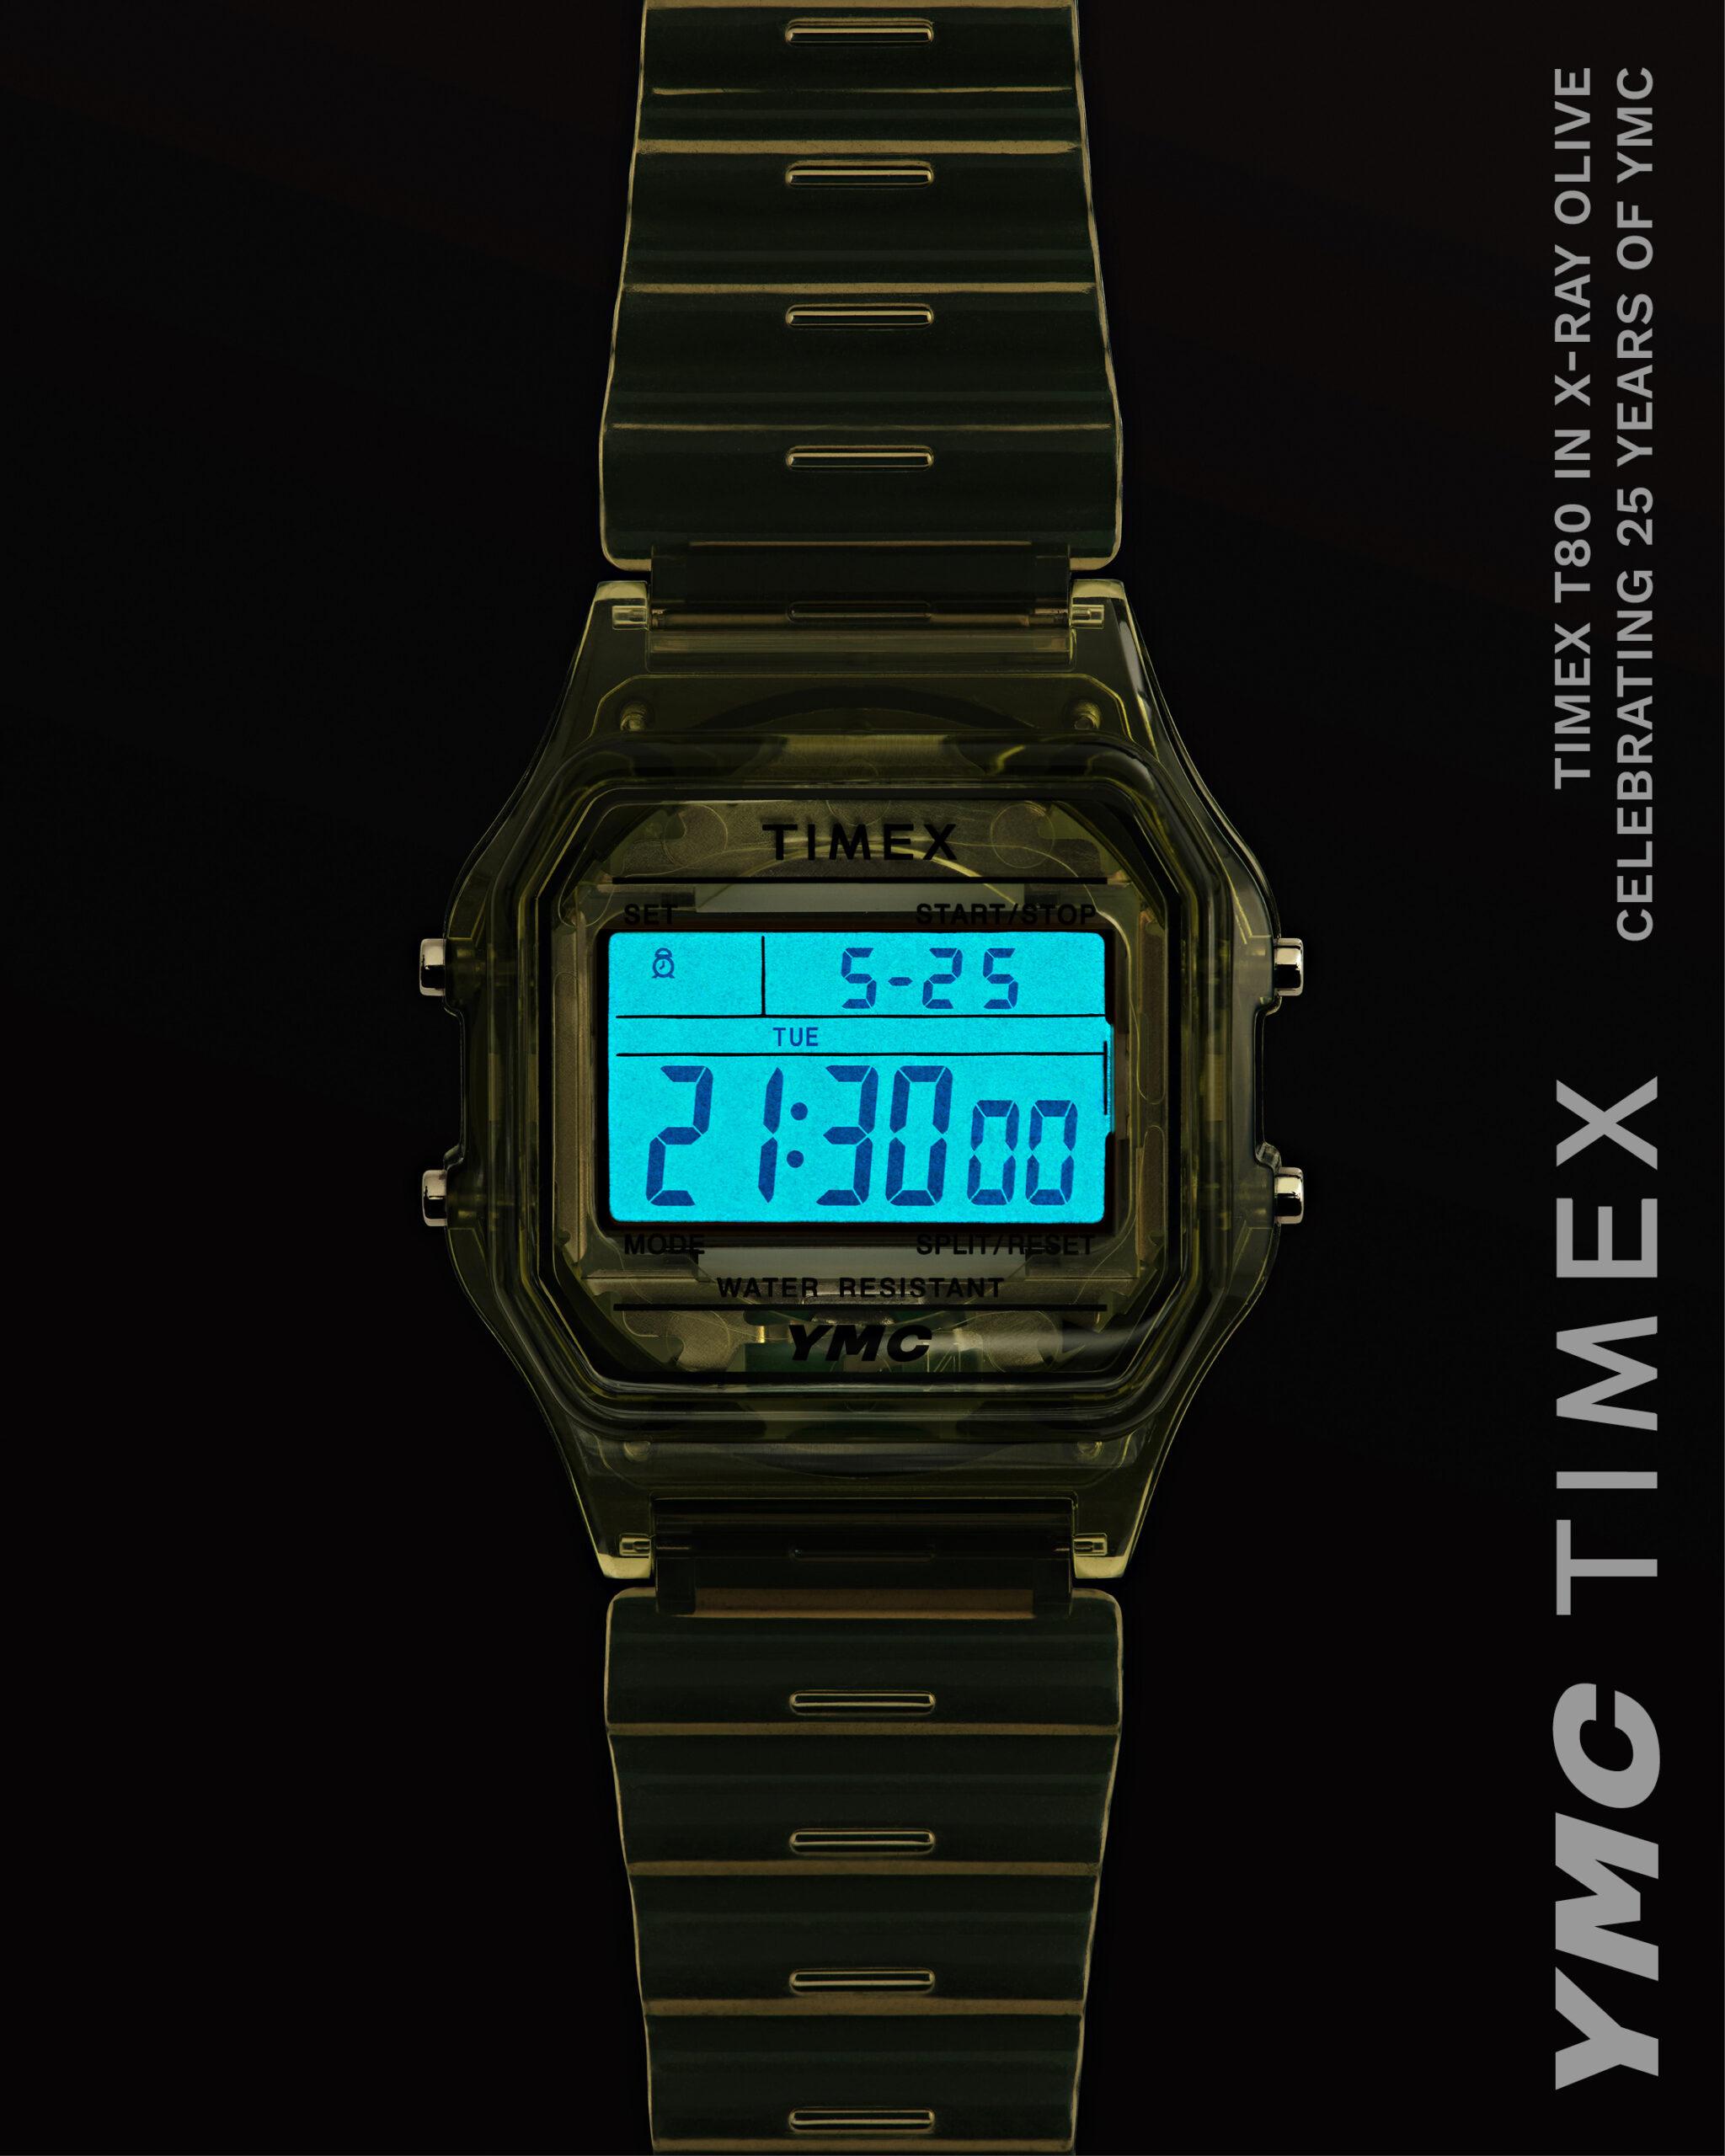 YMC Timex watch with Indiglo